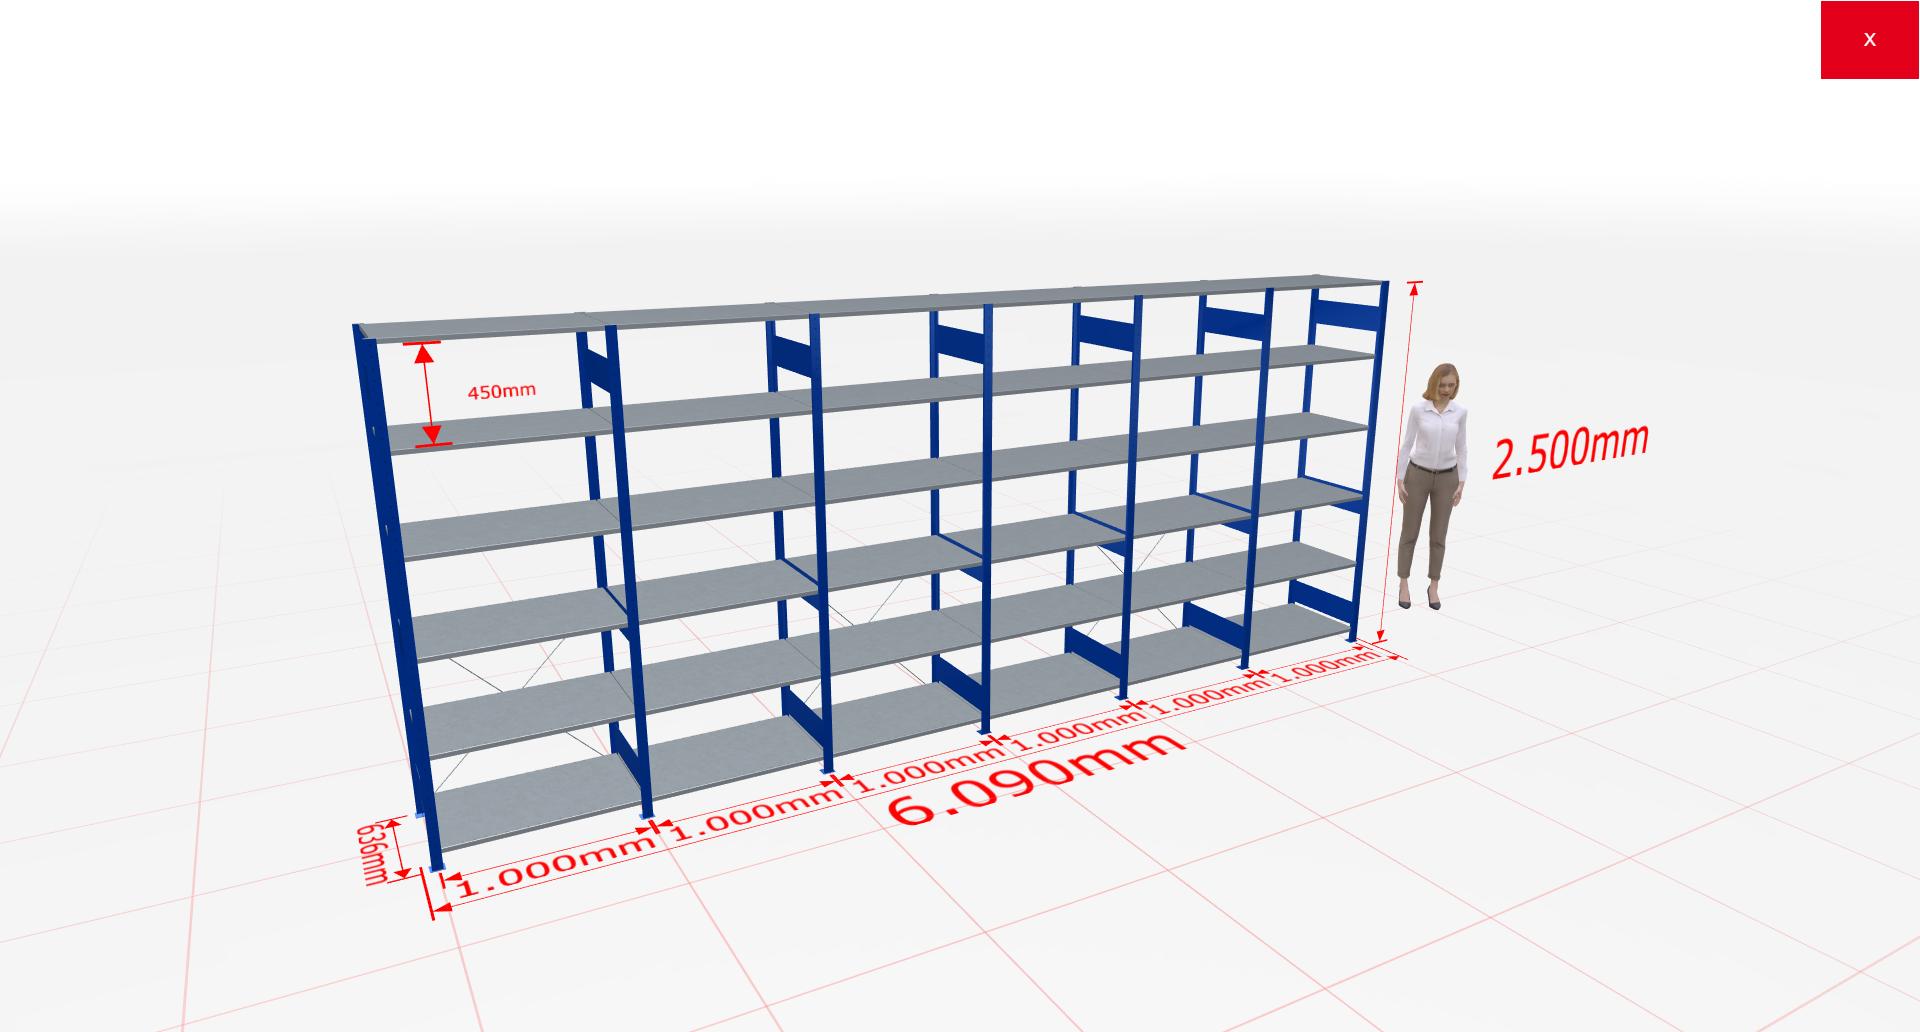 Fachbodenregal Komplettregal 2500x6090x600 mm (HxBxT) SCHULTE Lagertechnik blau 6 Ebenen  150 kg je Boden